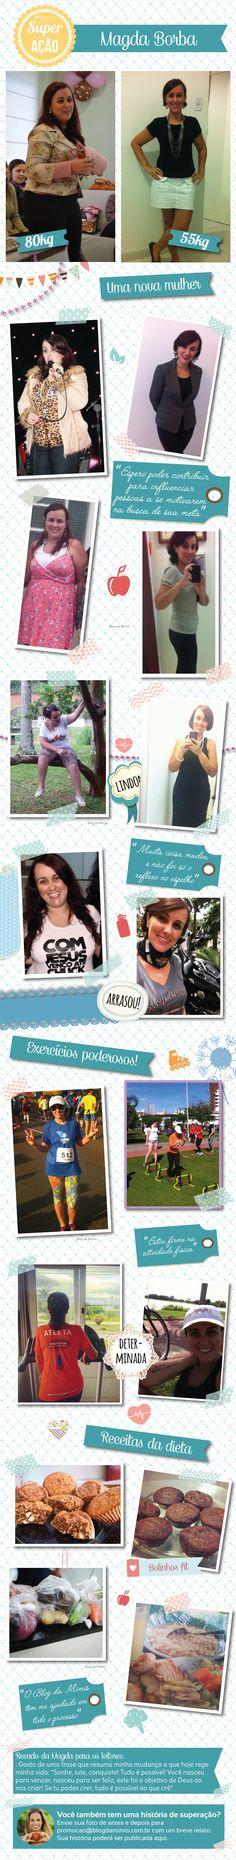 Superação Magda: 25Kg a menos ao eliminar fast-food da dieta - Blog da Mimis… Fitness Motivation, Health, Tips, Food, Healthy Mind, Lean Body, Make Up, Metabolism, Diets